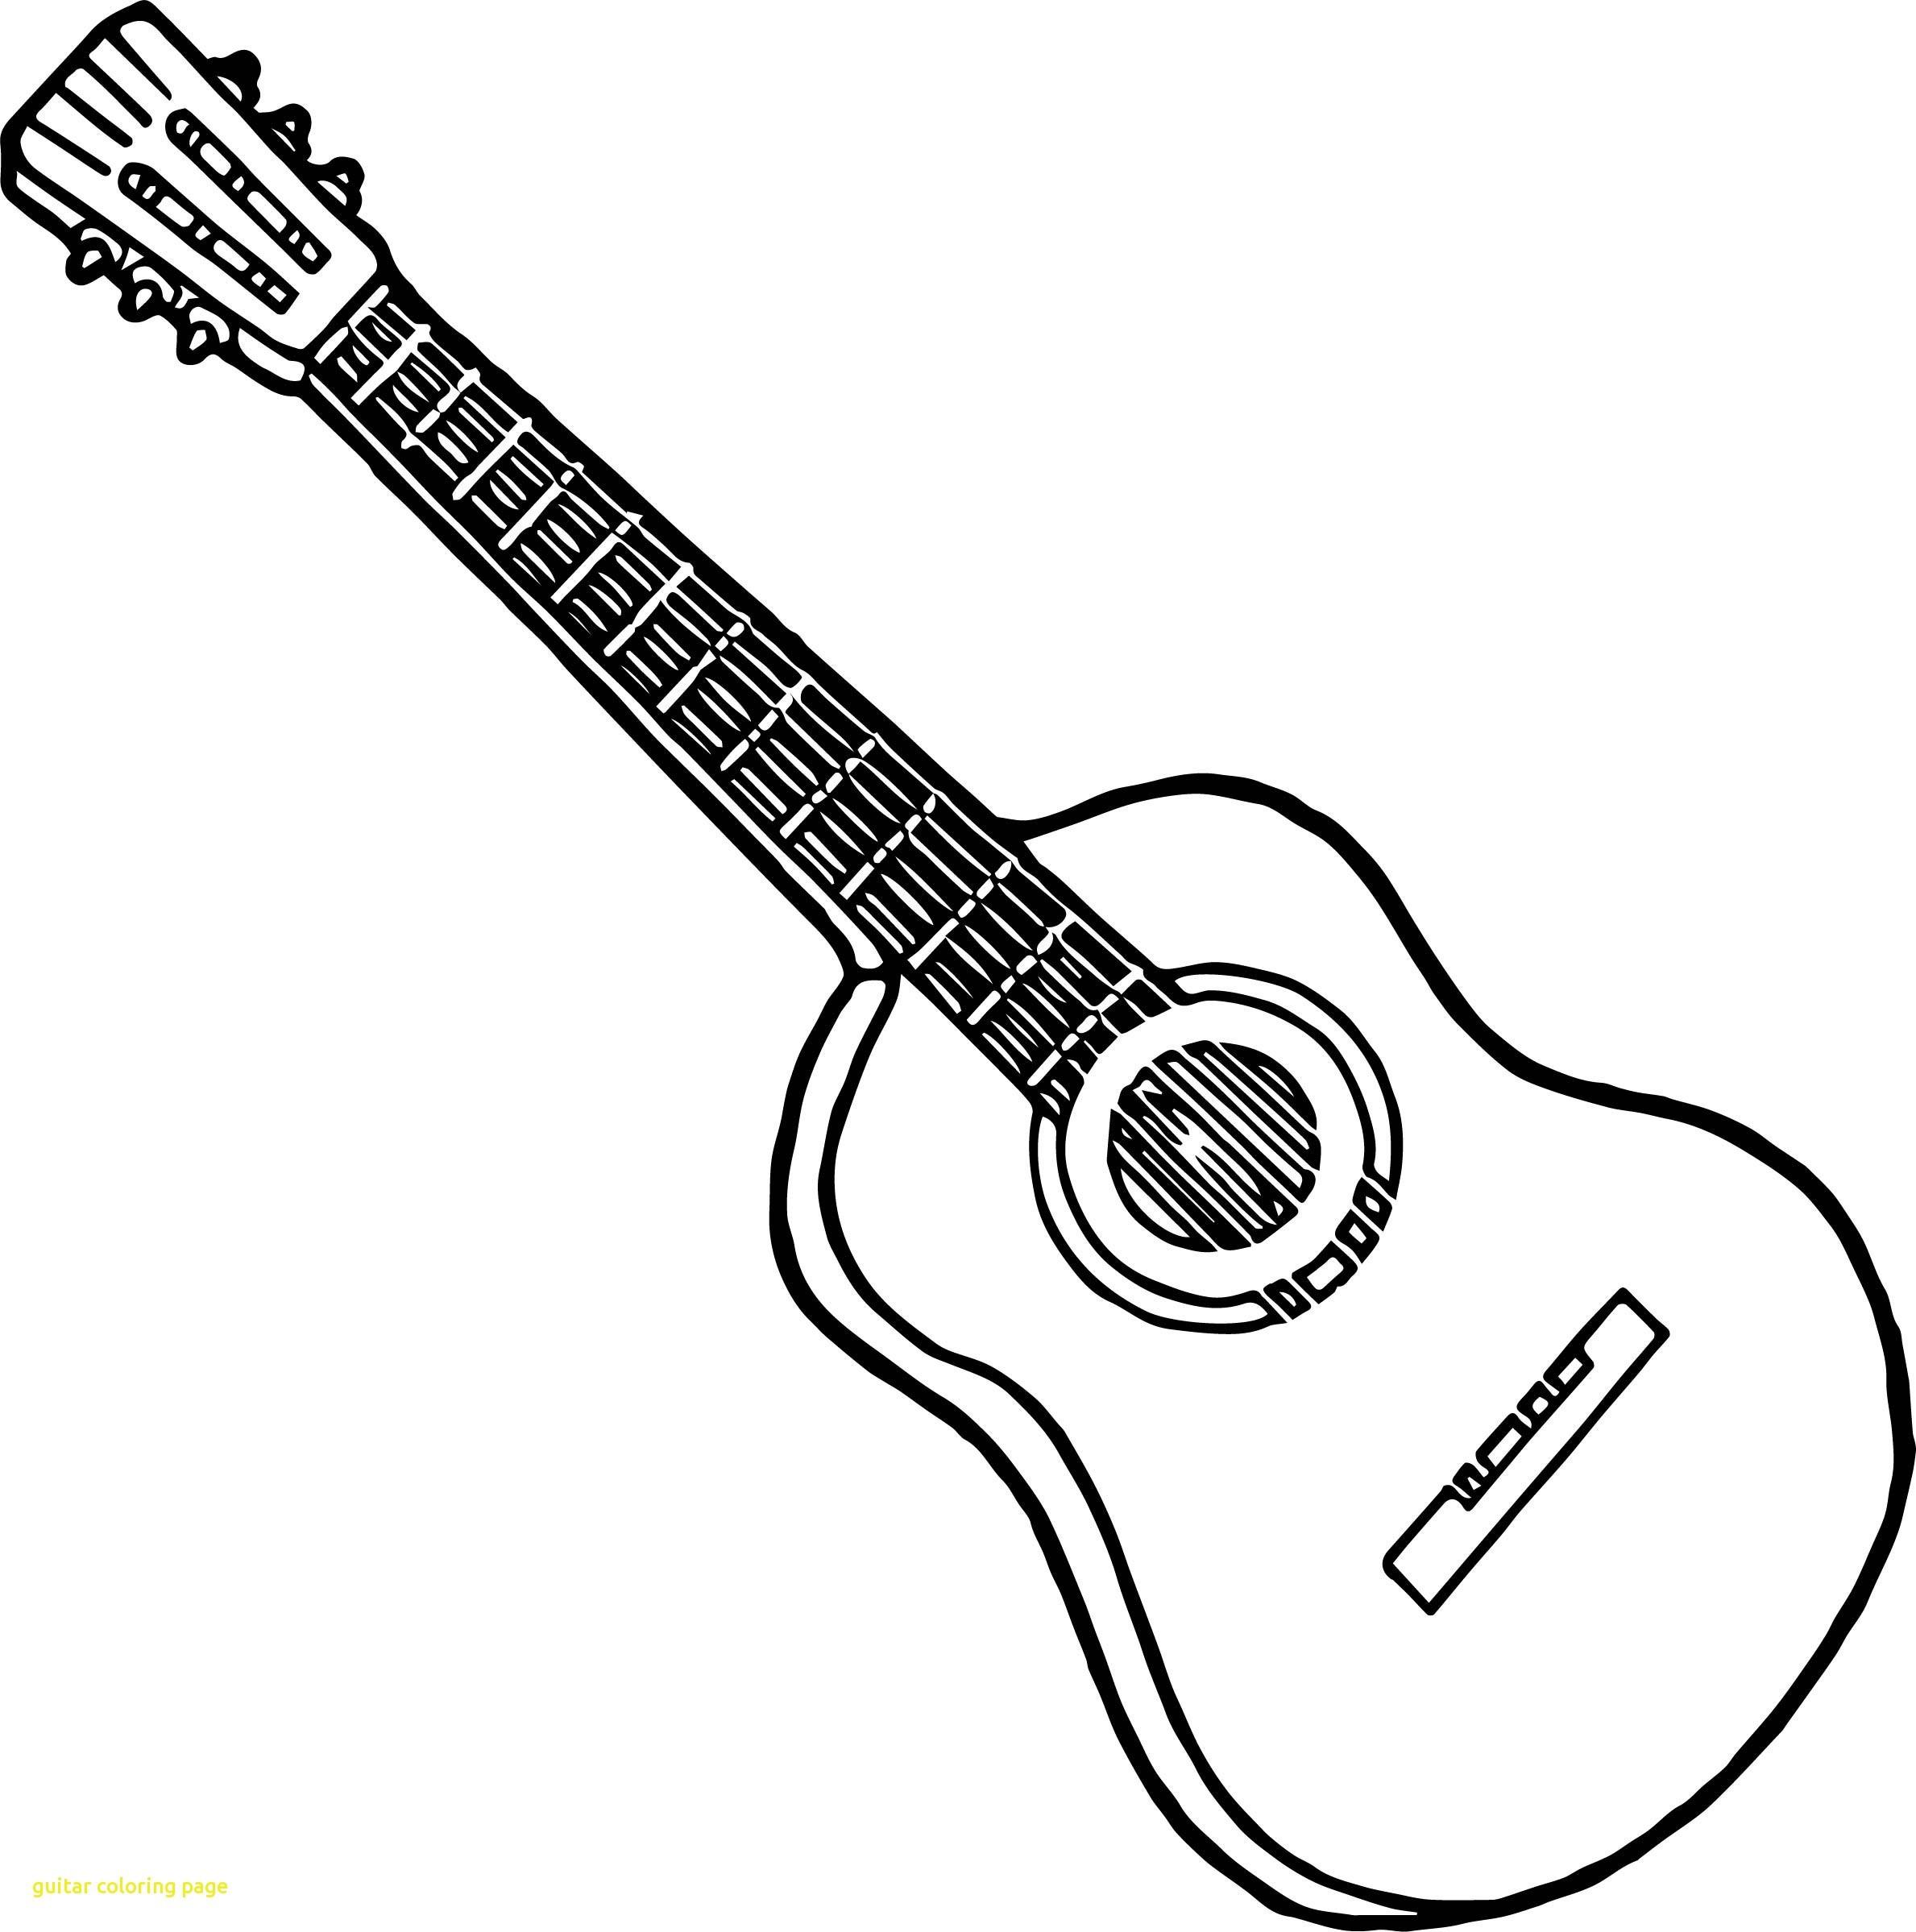 23+ Creative Picture of Guitar Coloring Page - birijus.com